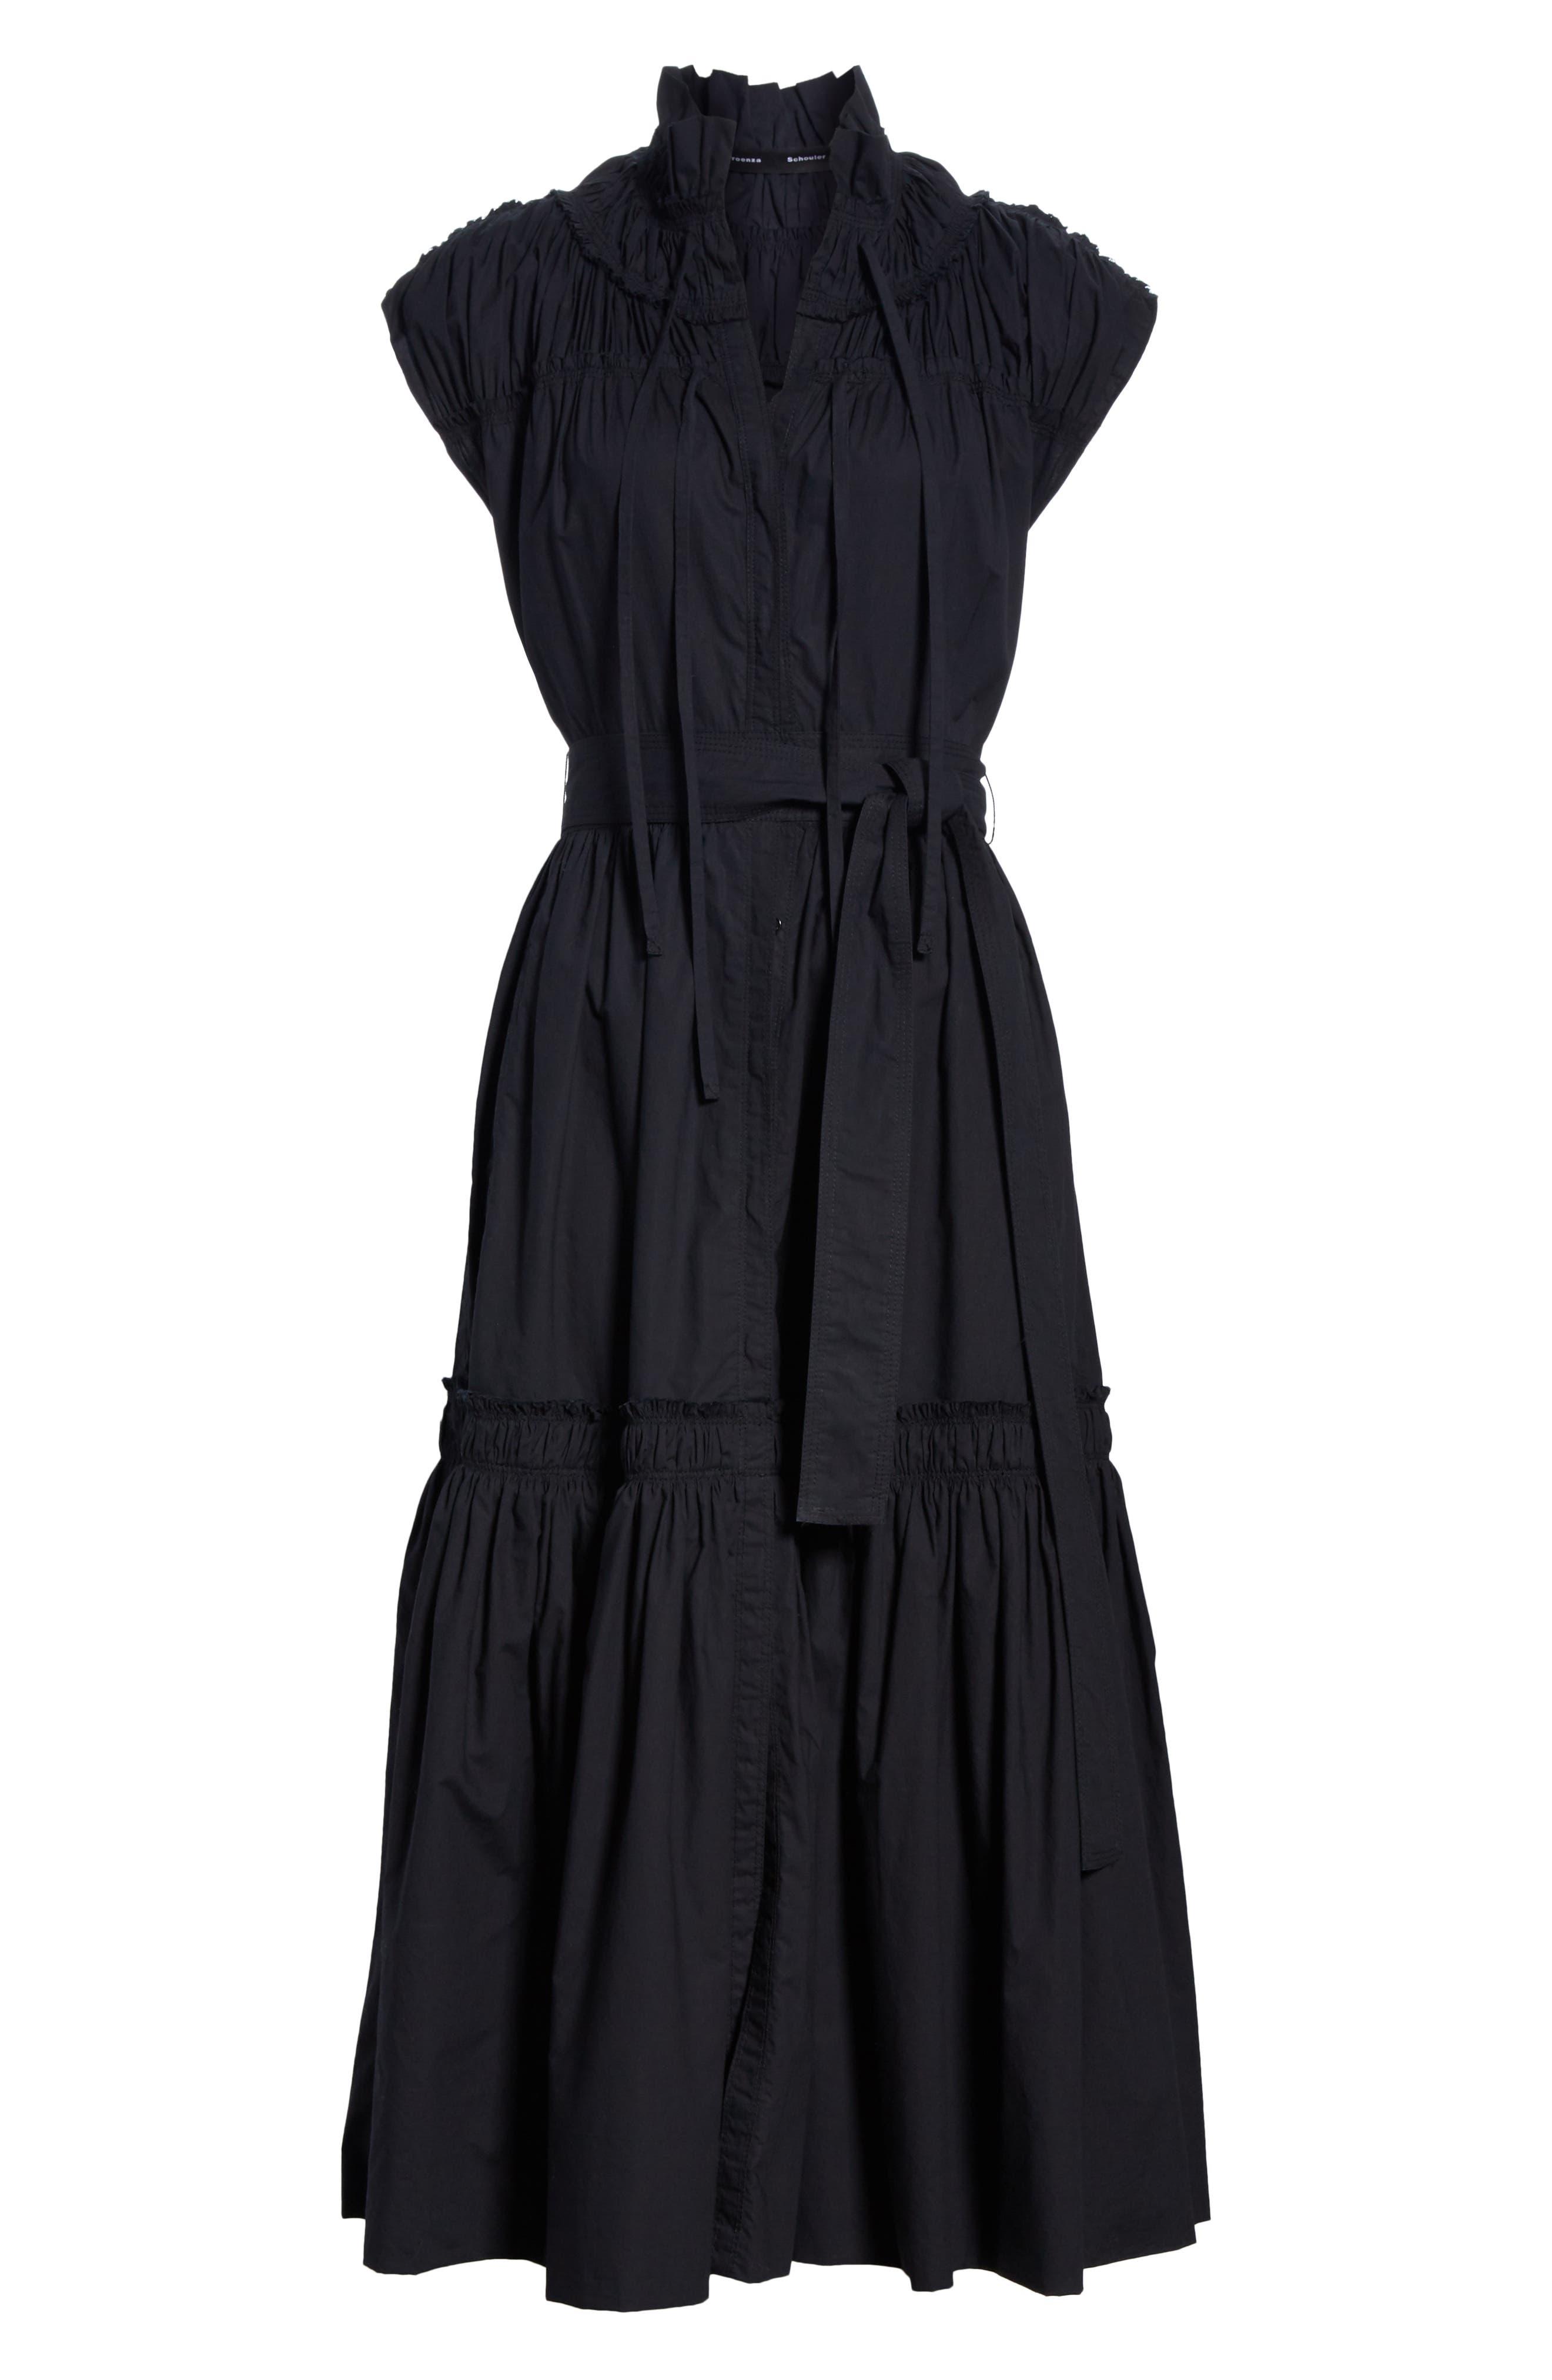 PROENZA SCHOULER, Smocked Poplin Dress, Alternate thumbnail 7, color, BLACK